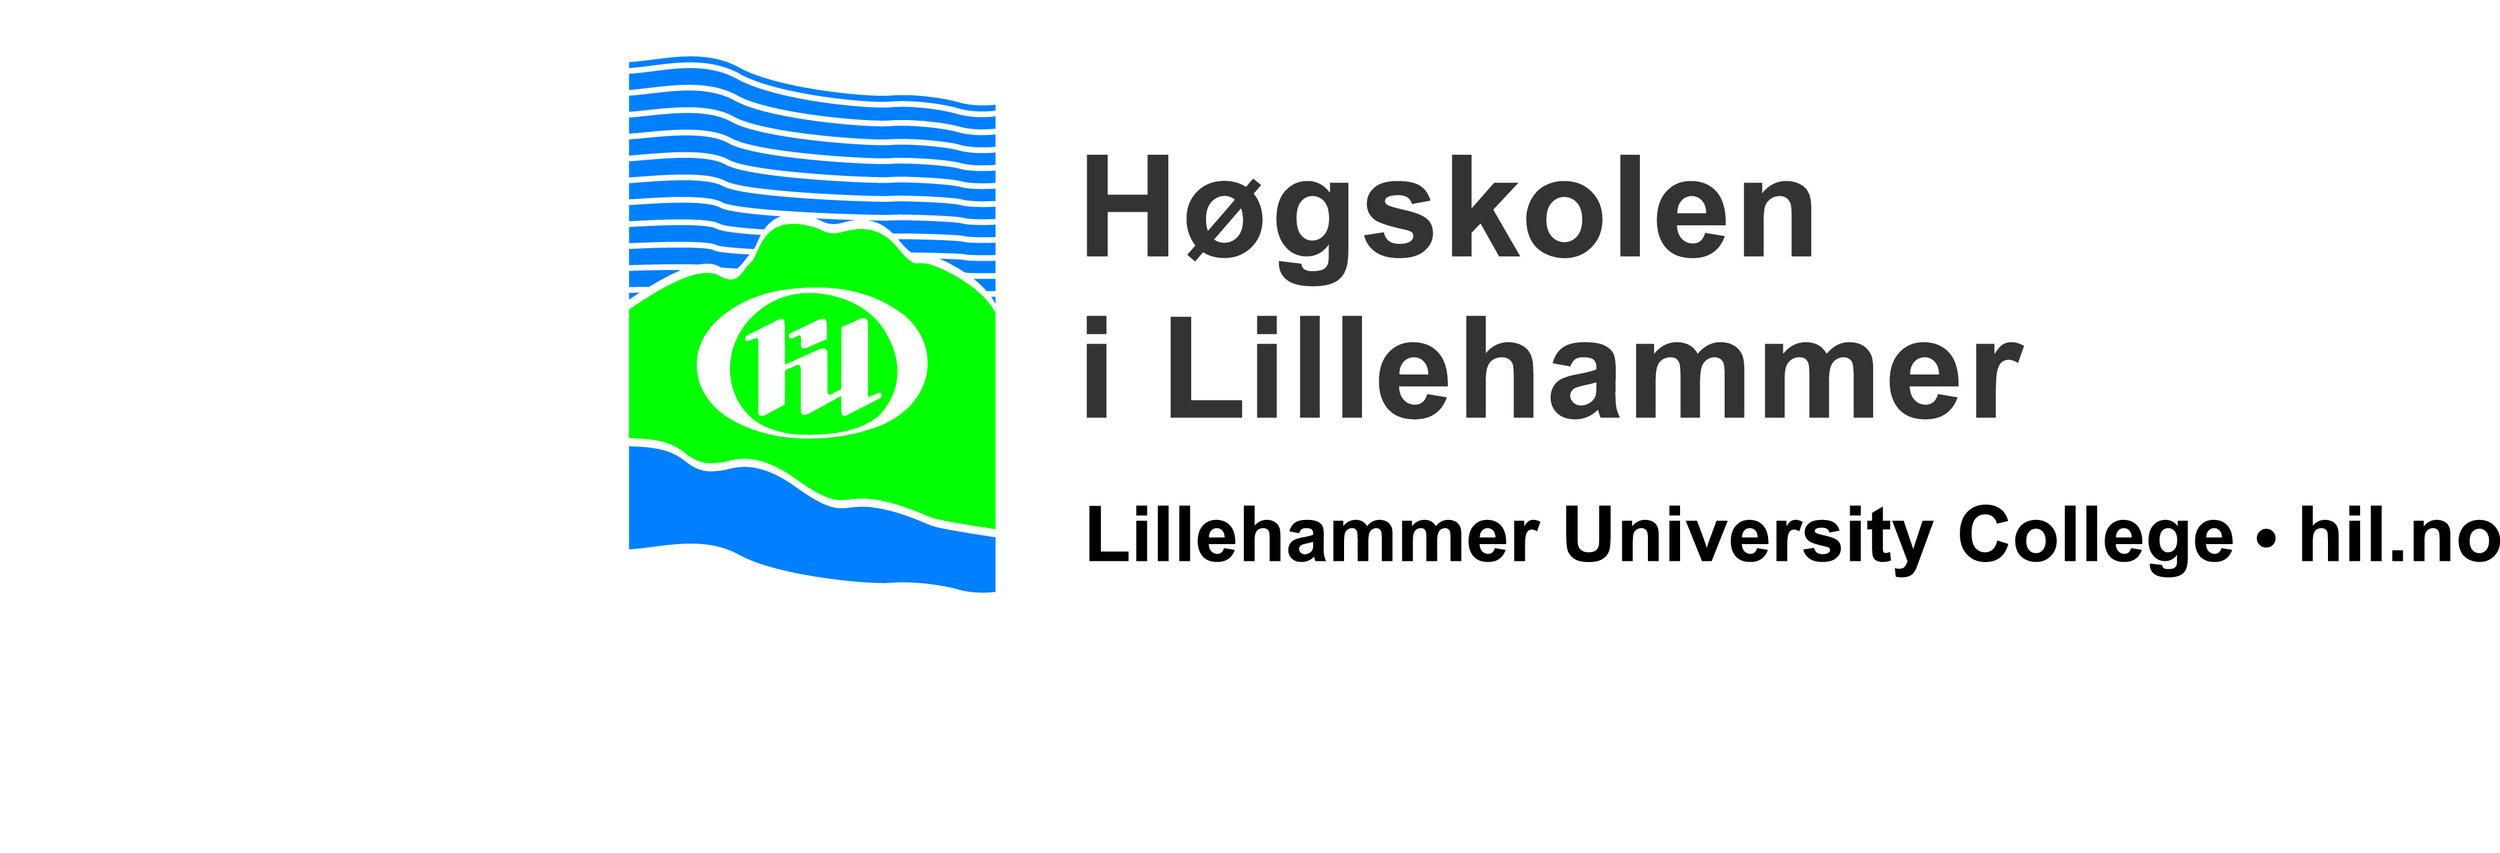 HiL_4f.jpg